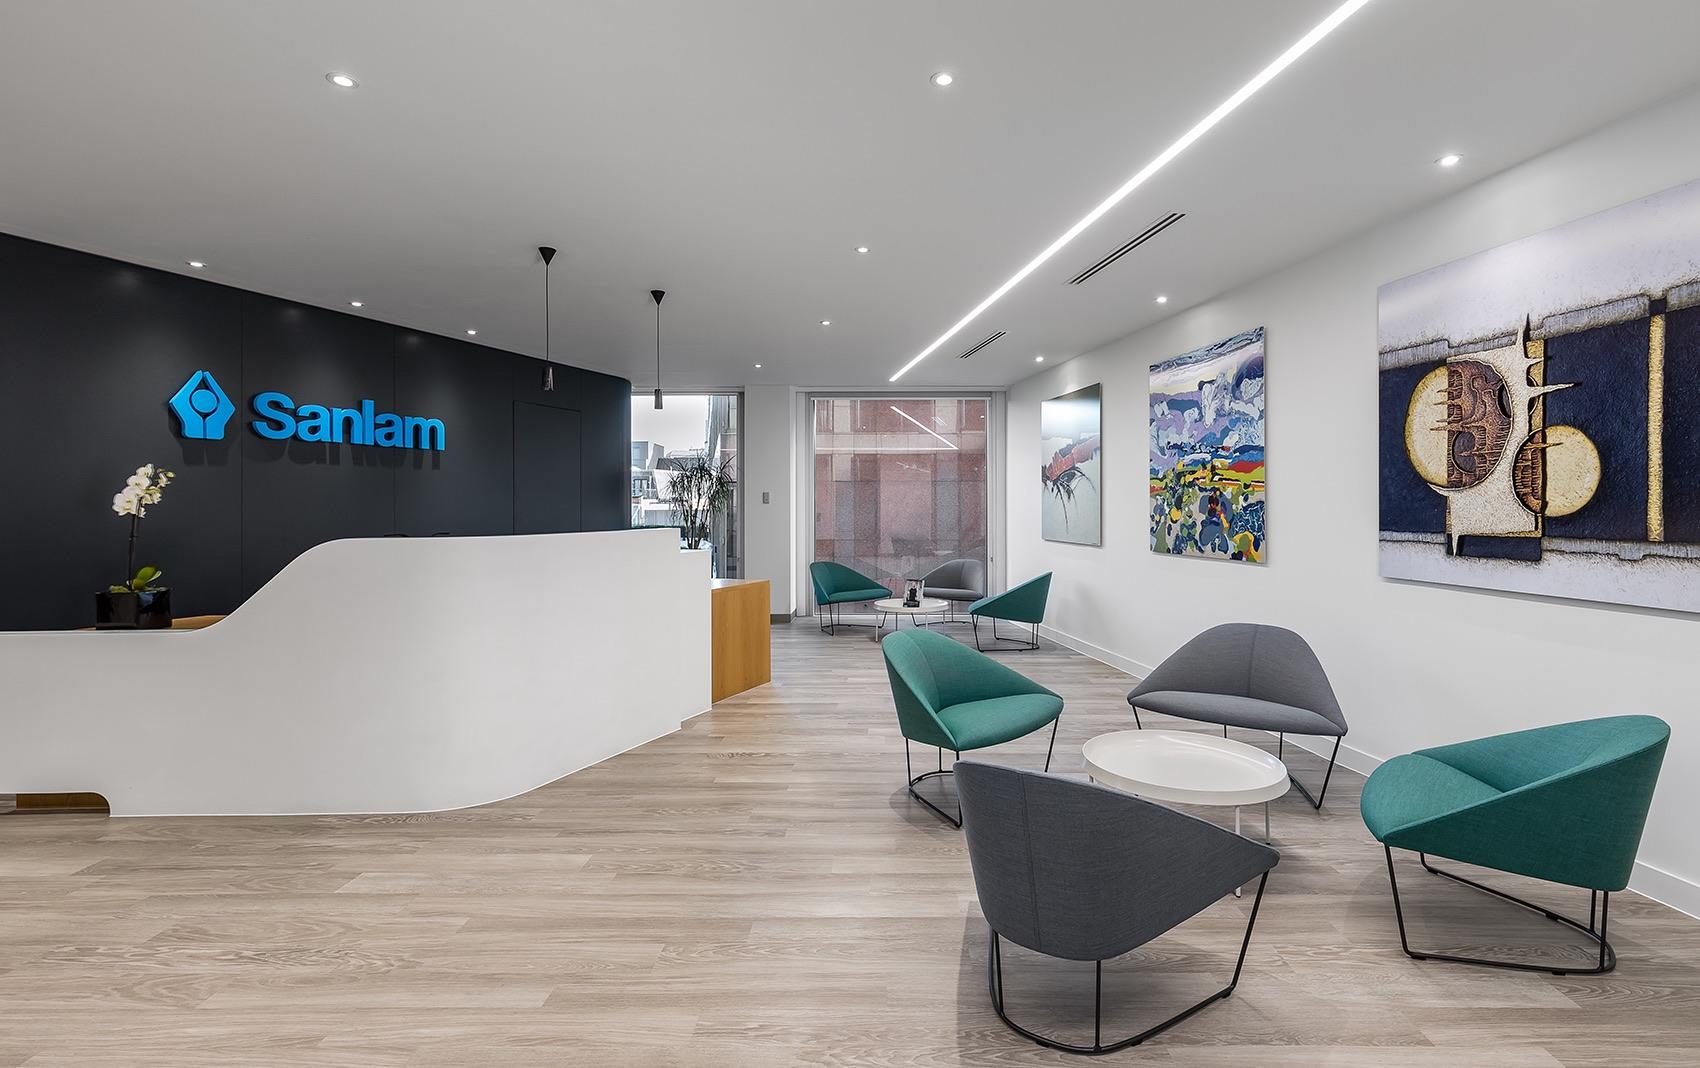 sanlam-london-office-3